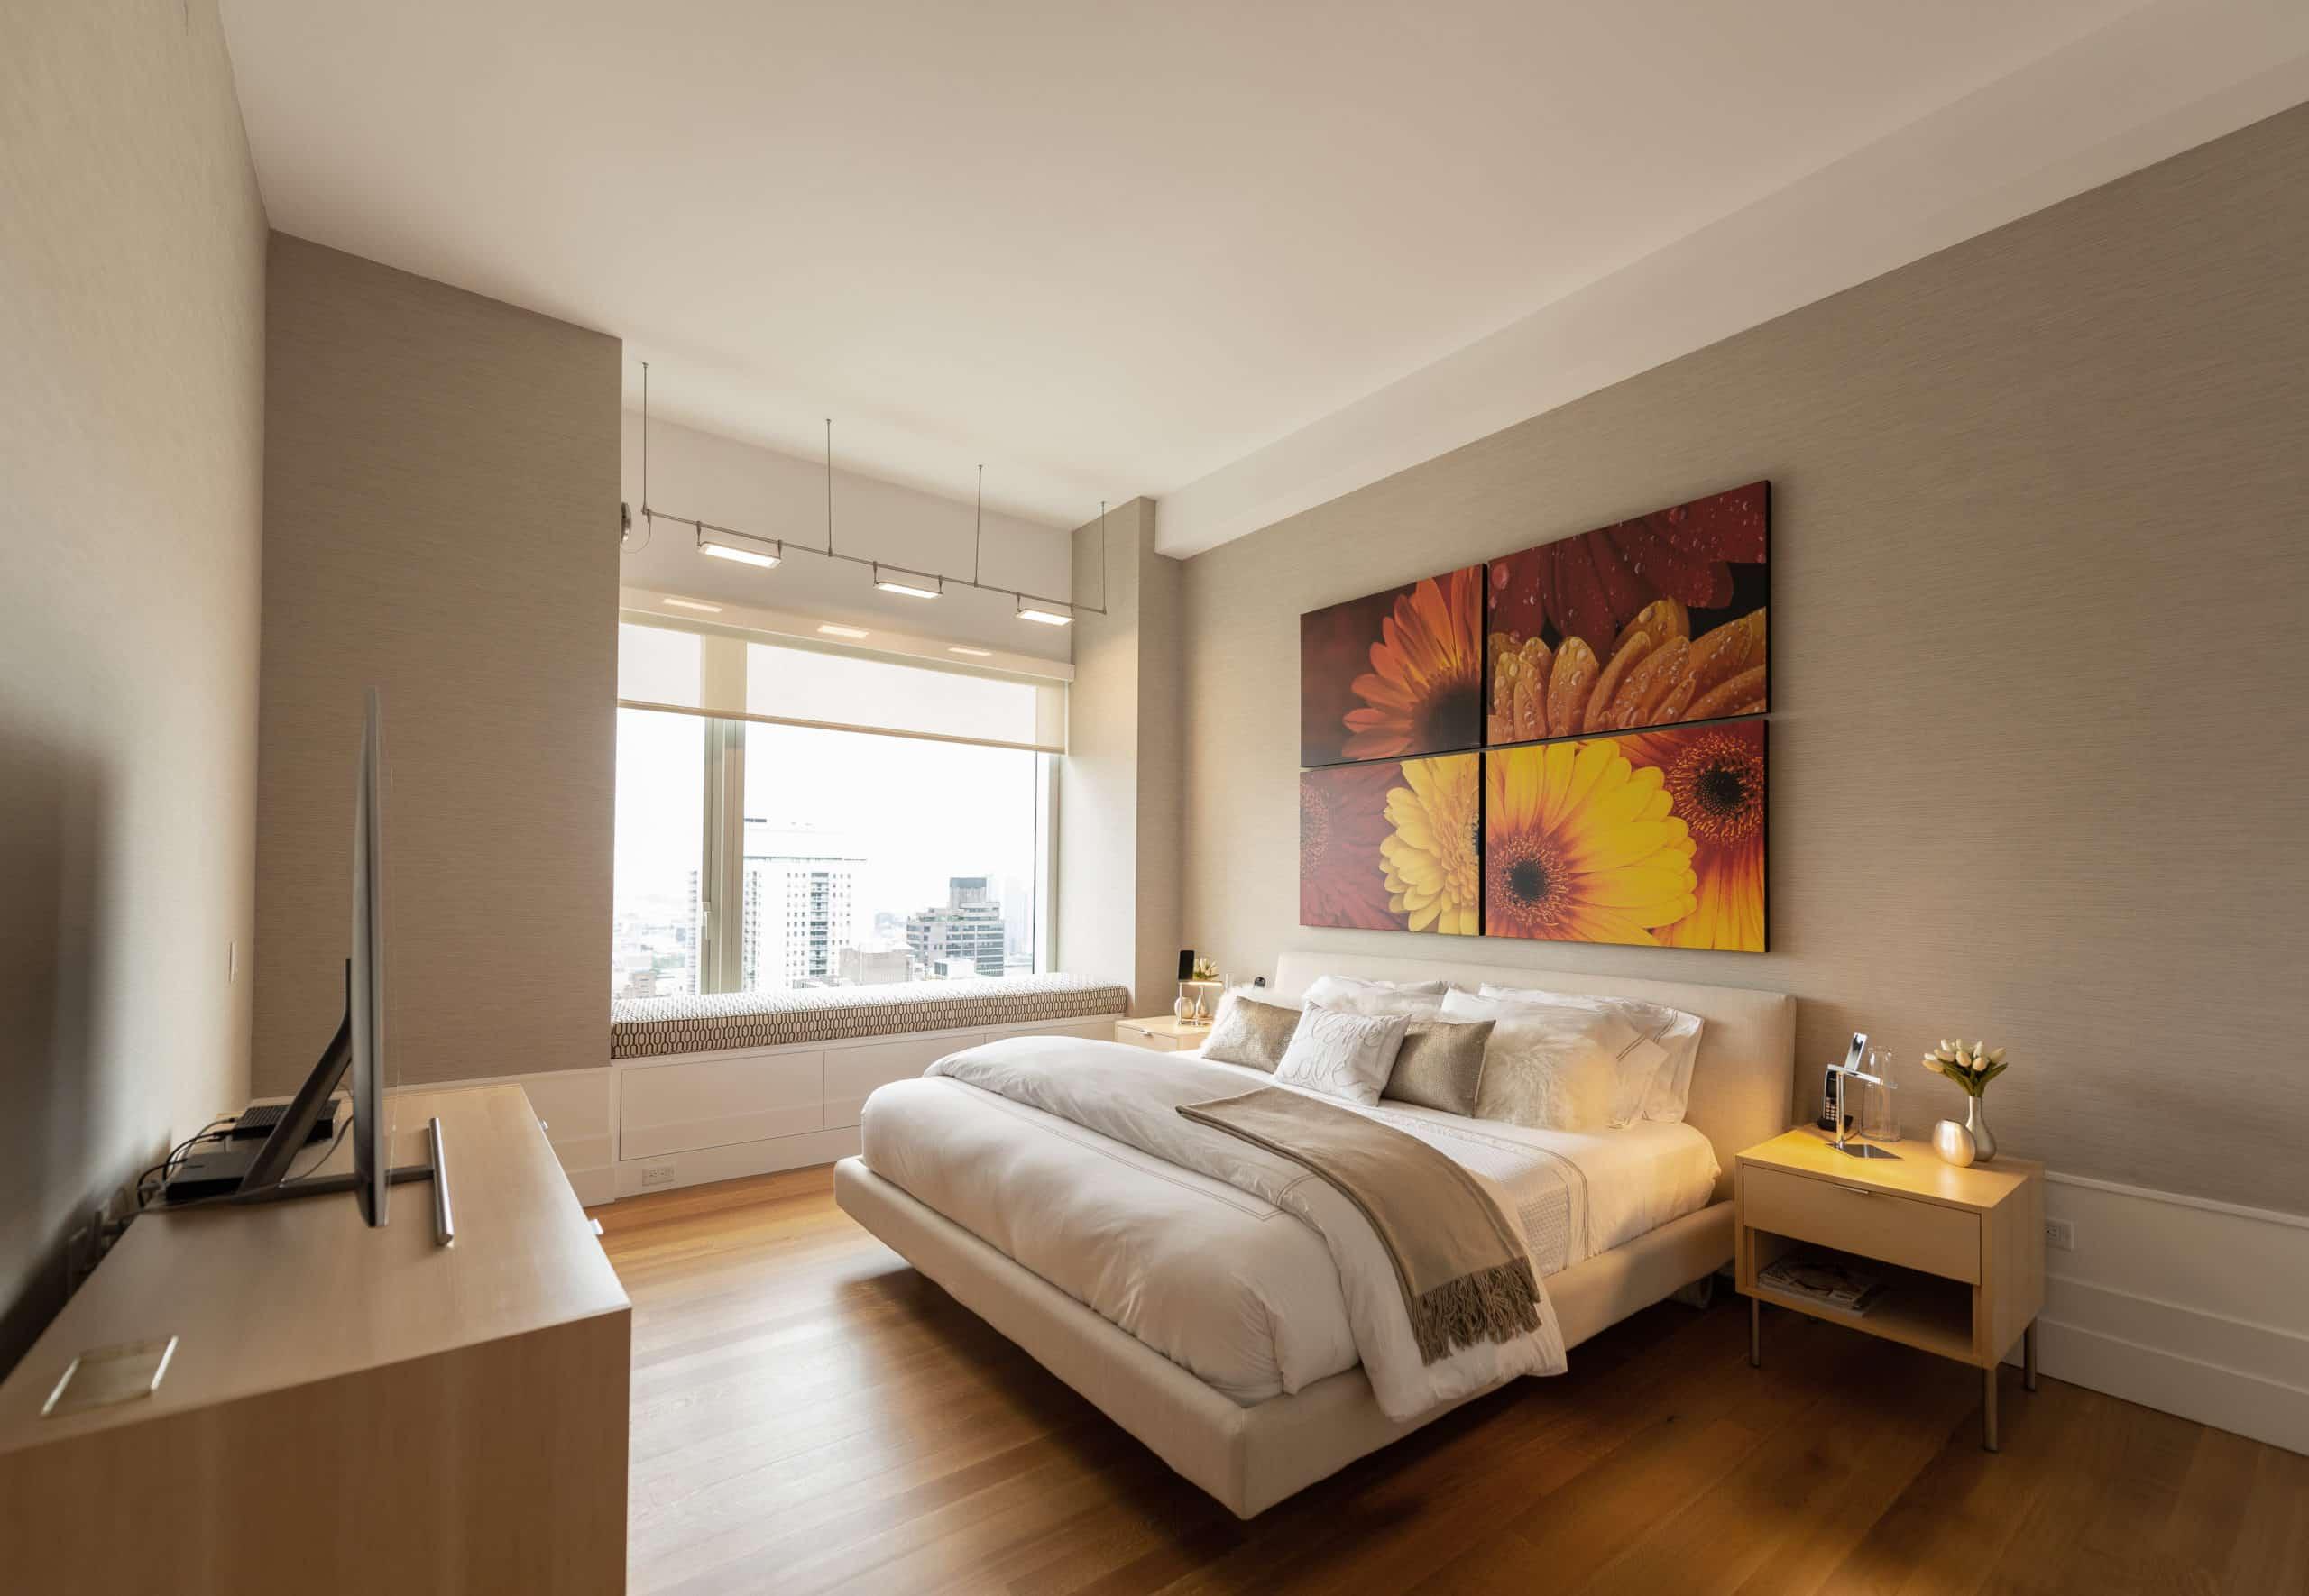 Luxury master bedroom interior design, New York City